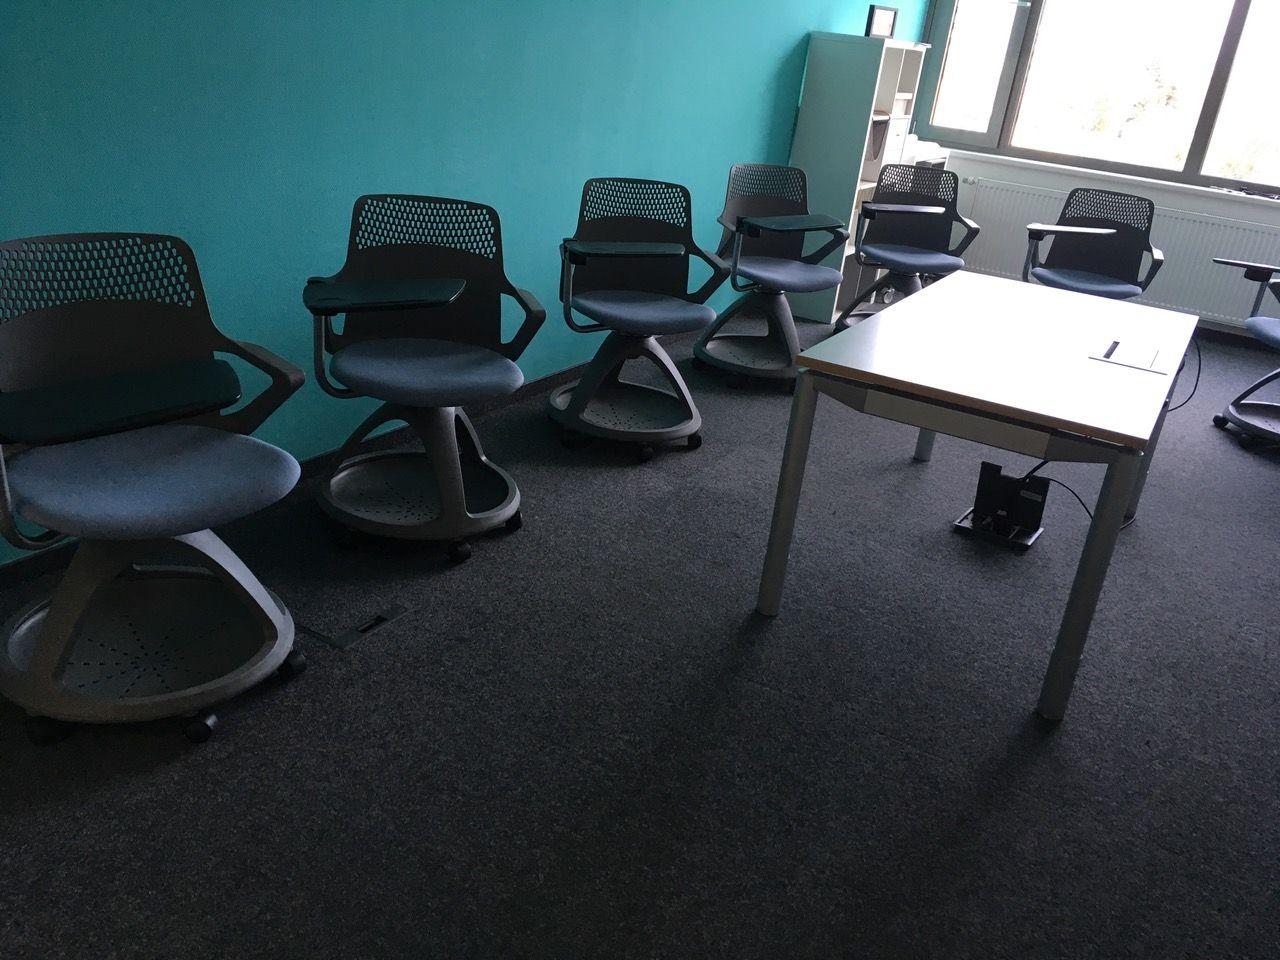 Training room - Hungary